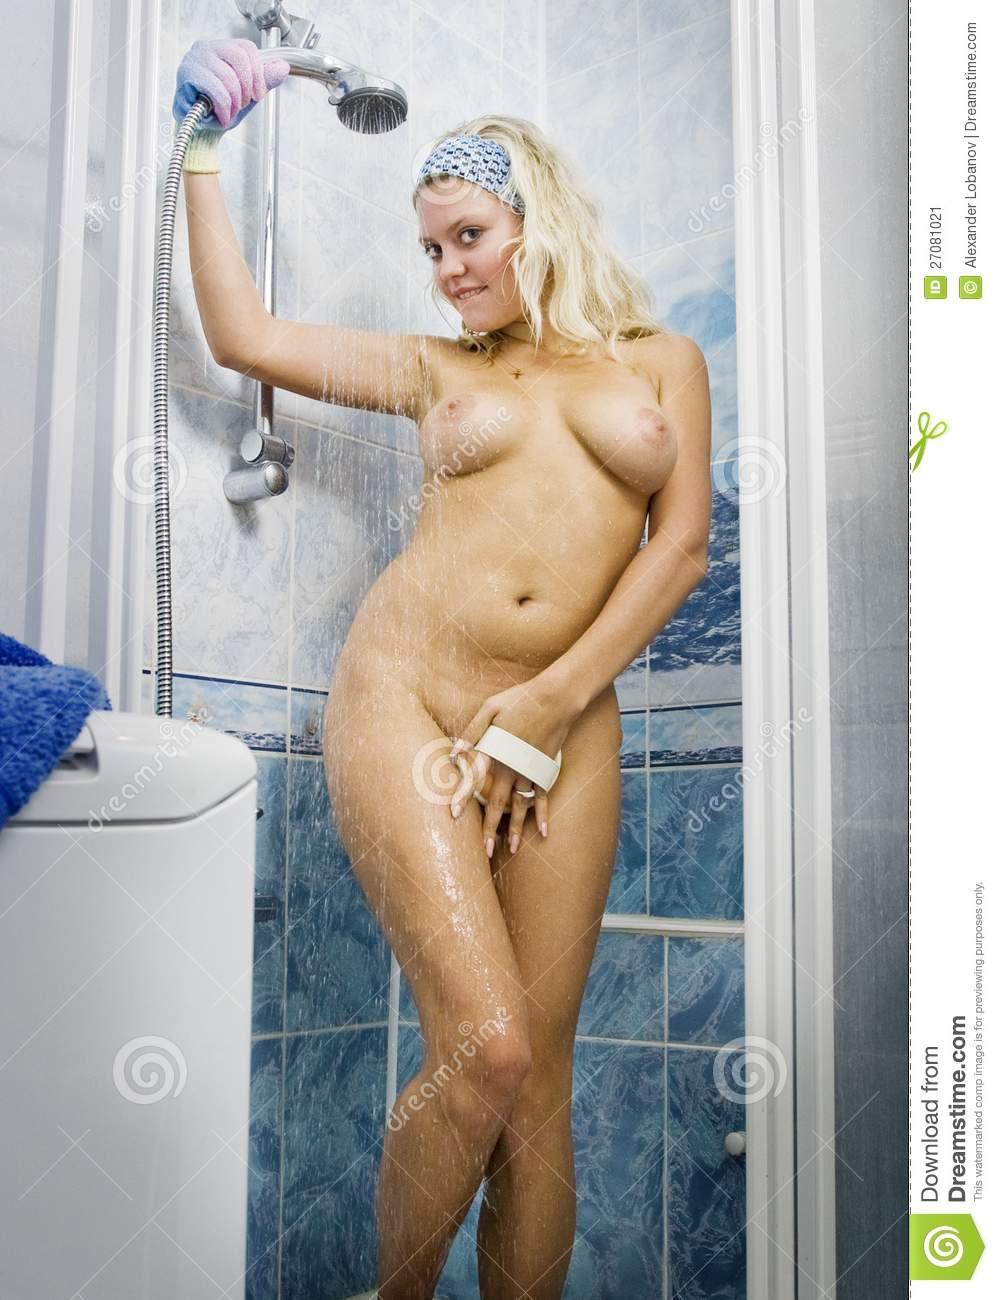 best of Hand shower 2018 held FuckBook Sex Naked